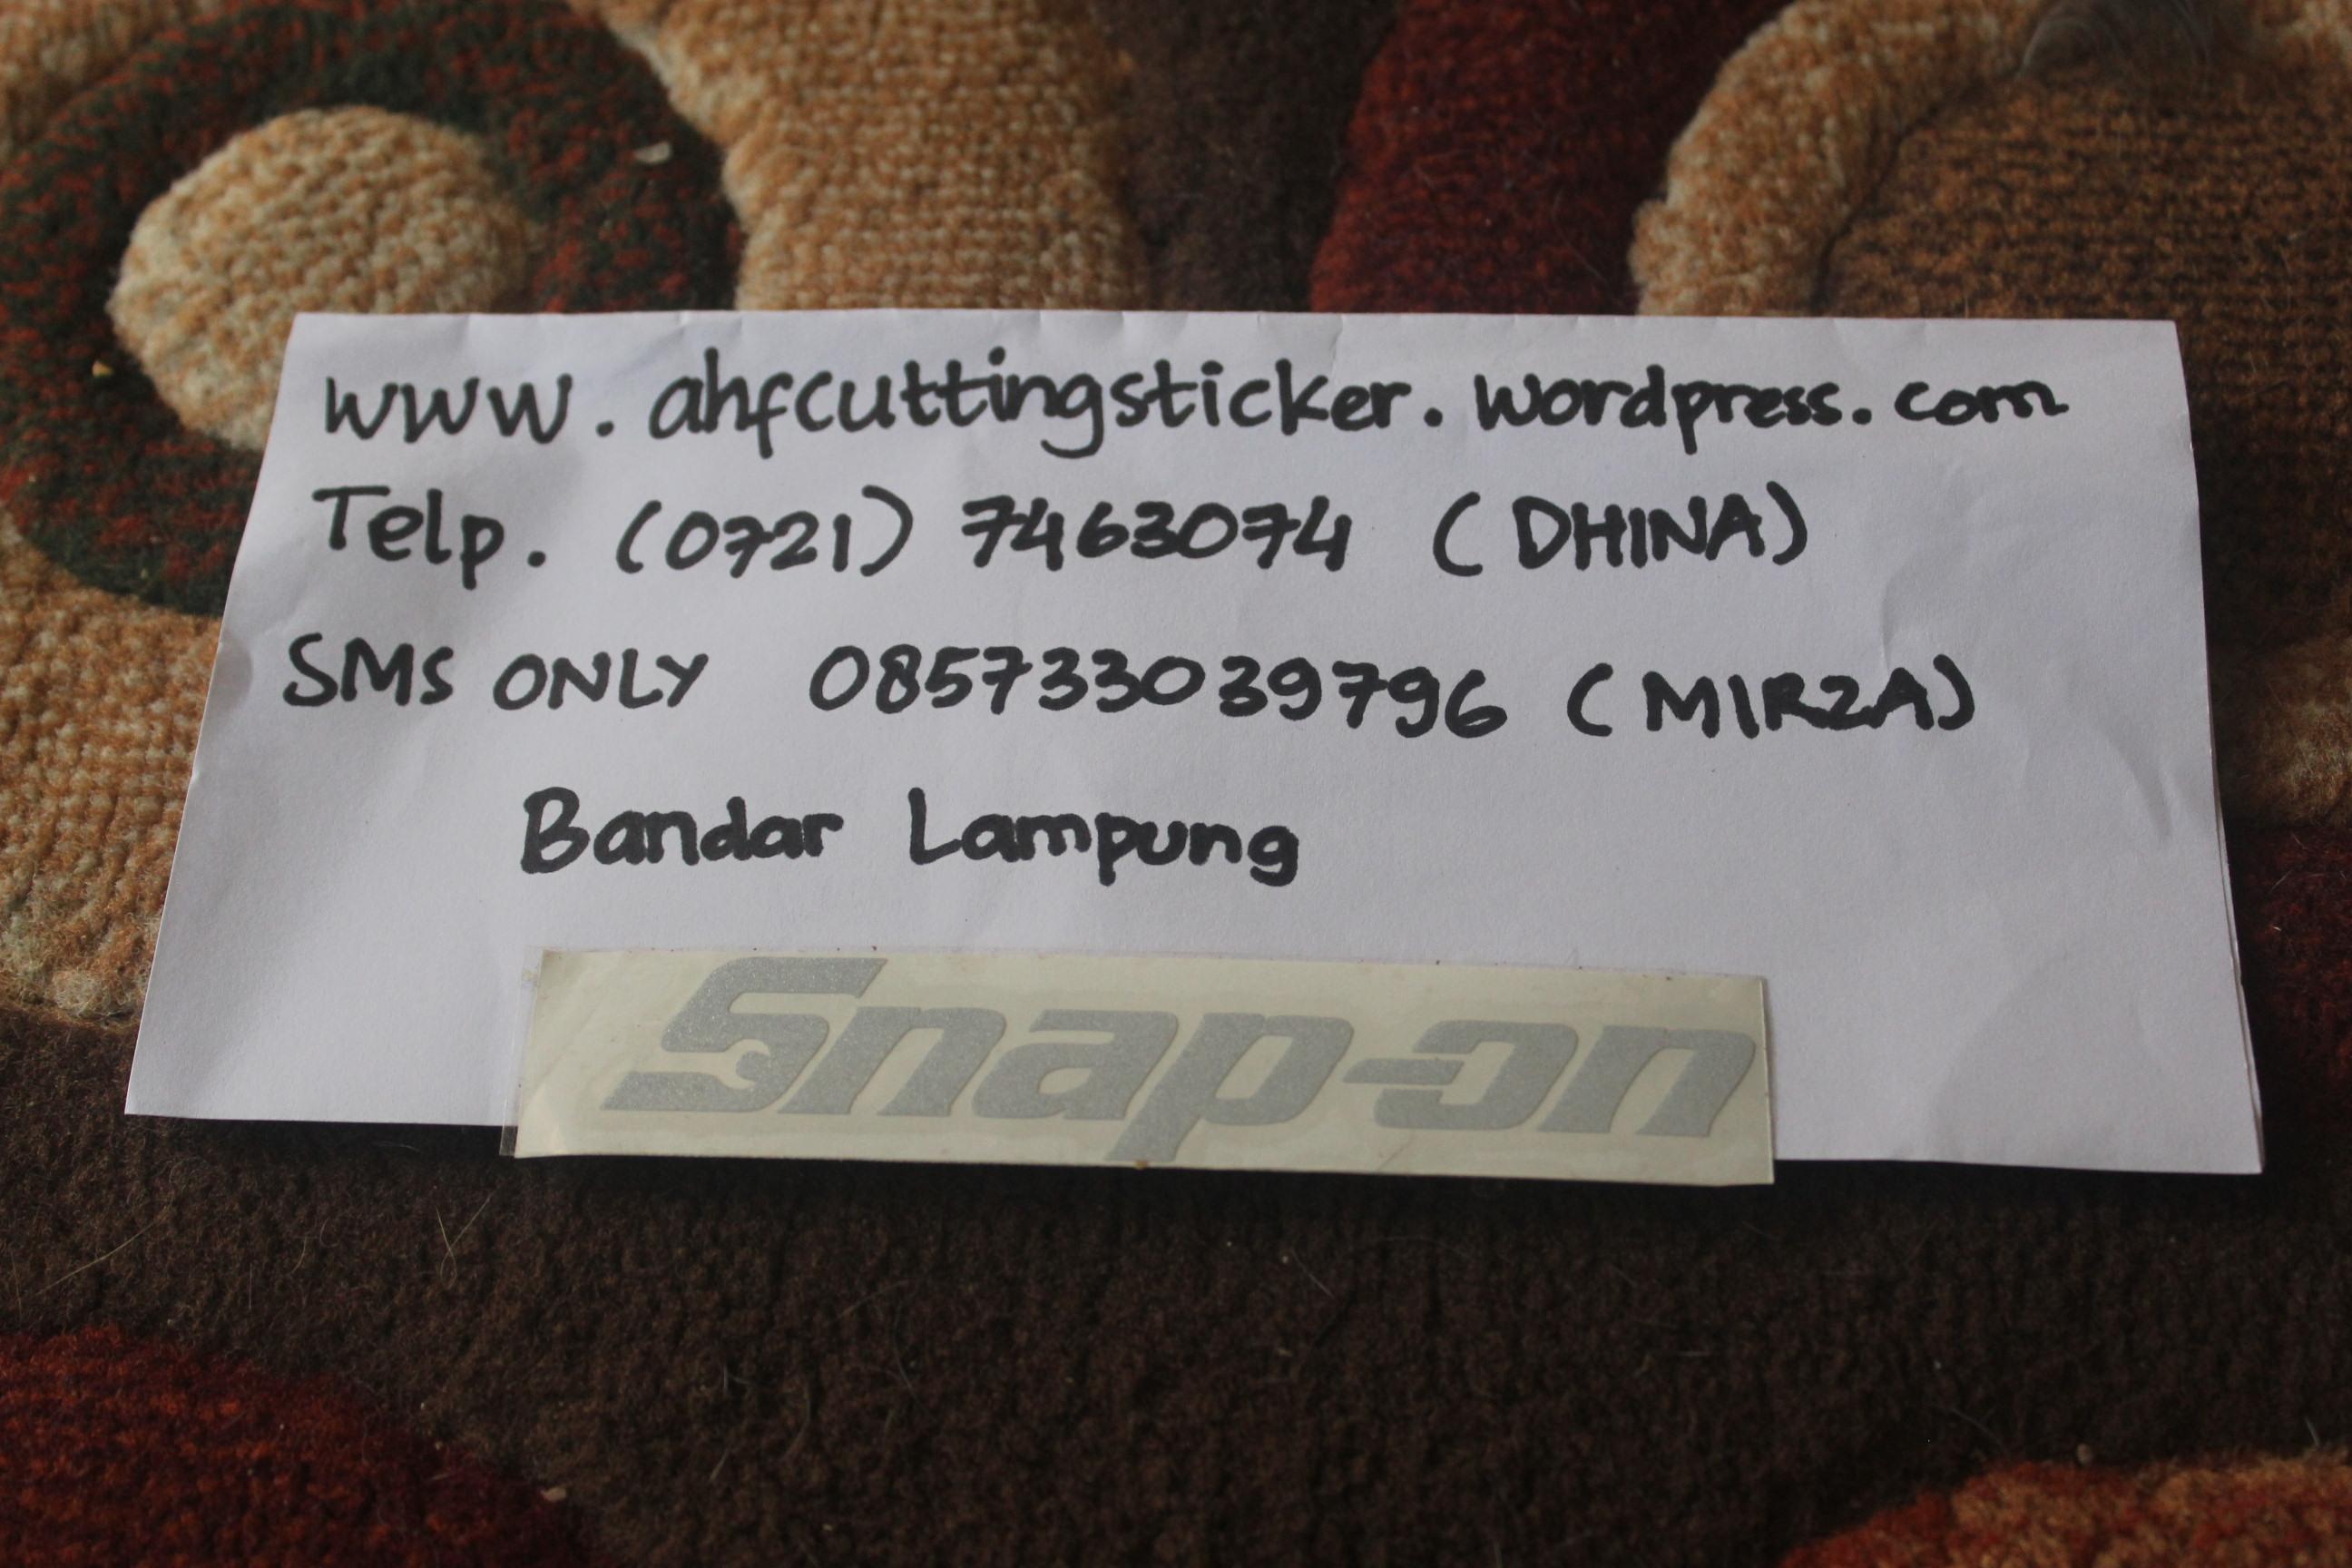 Otomotif Mail: Ahfcuttingsticker